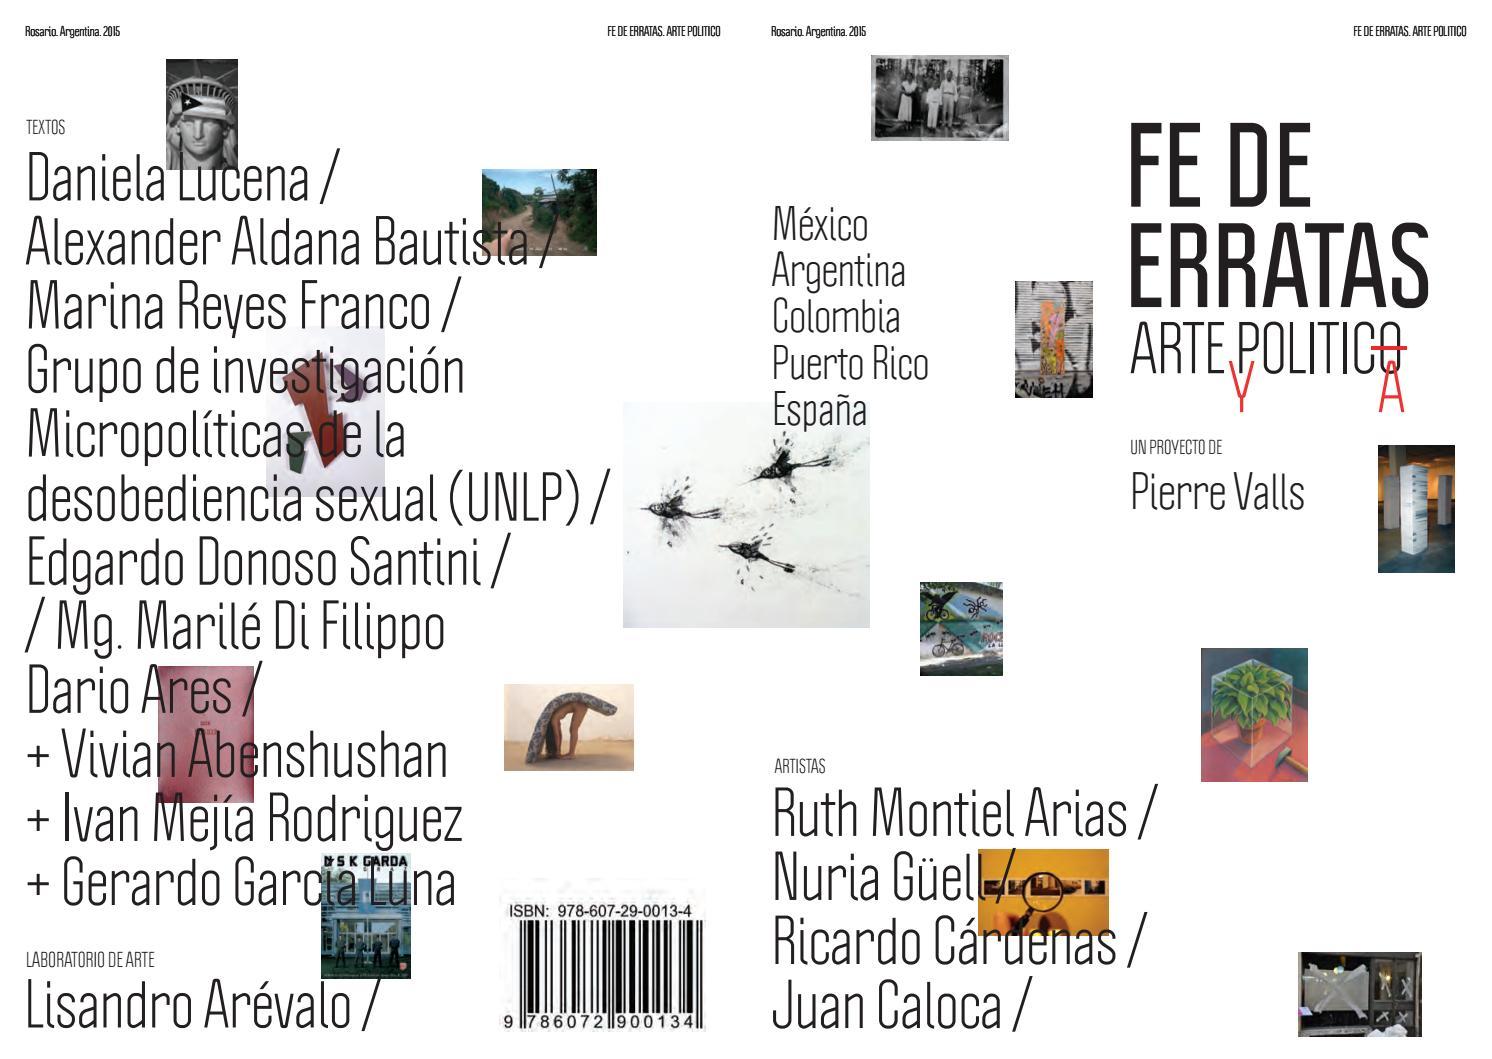 Fe de erratas: arte y política by kilu pierre - issuu